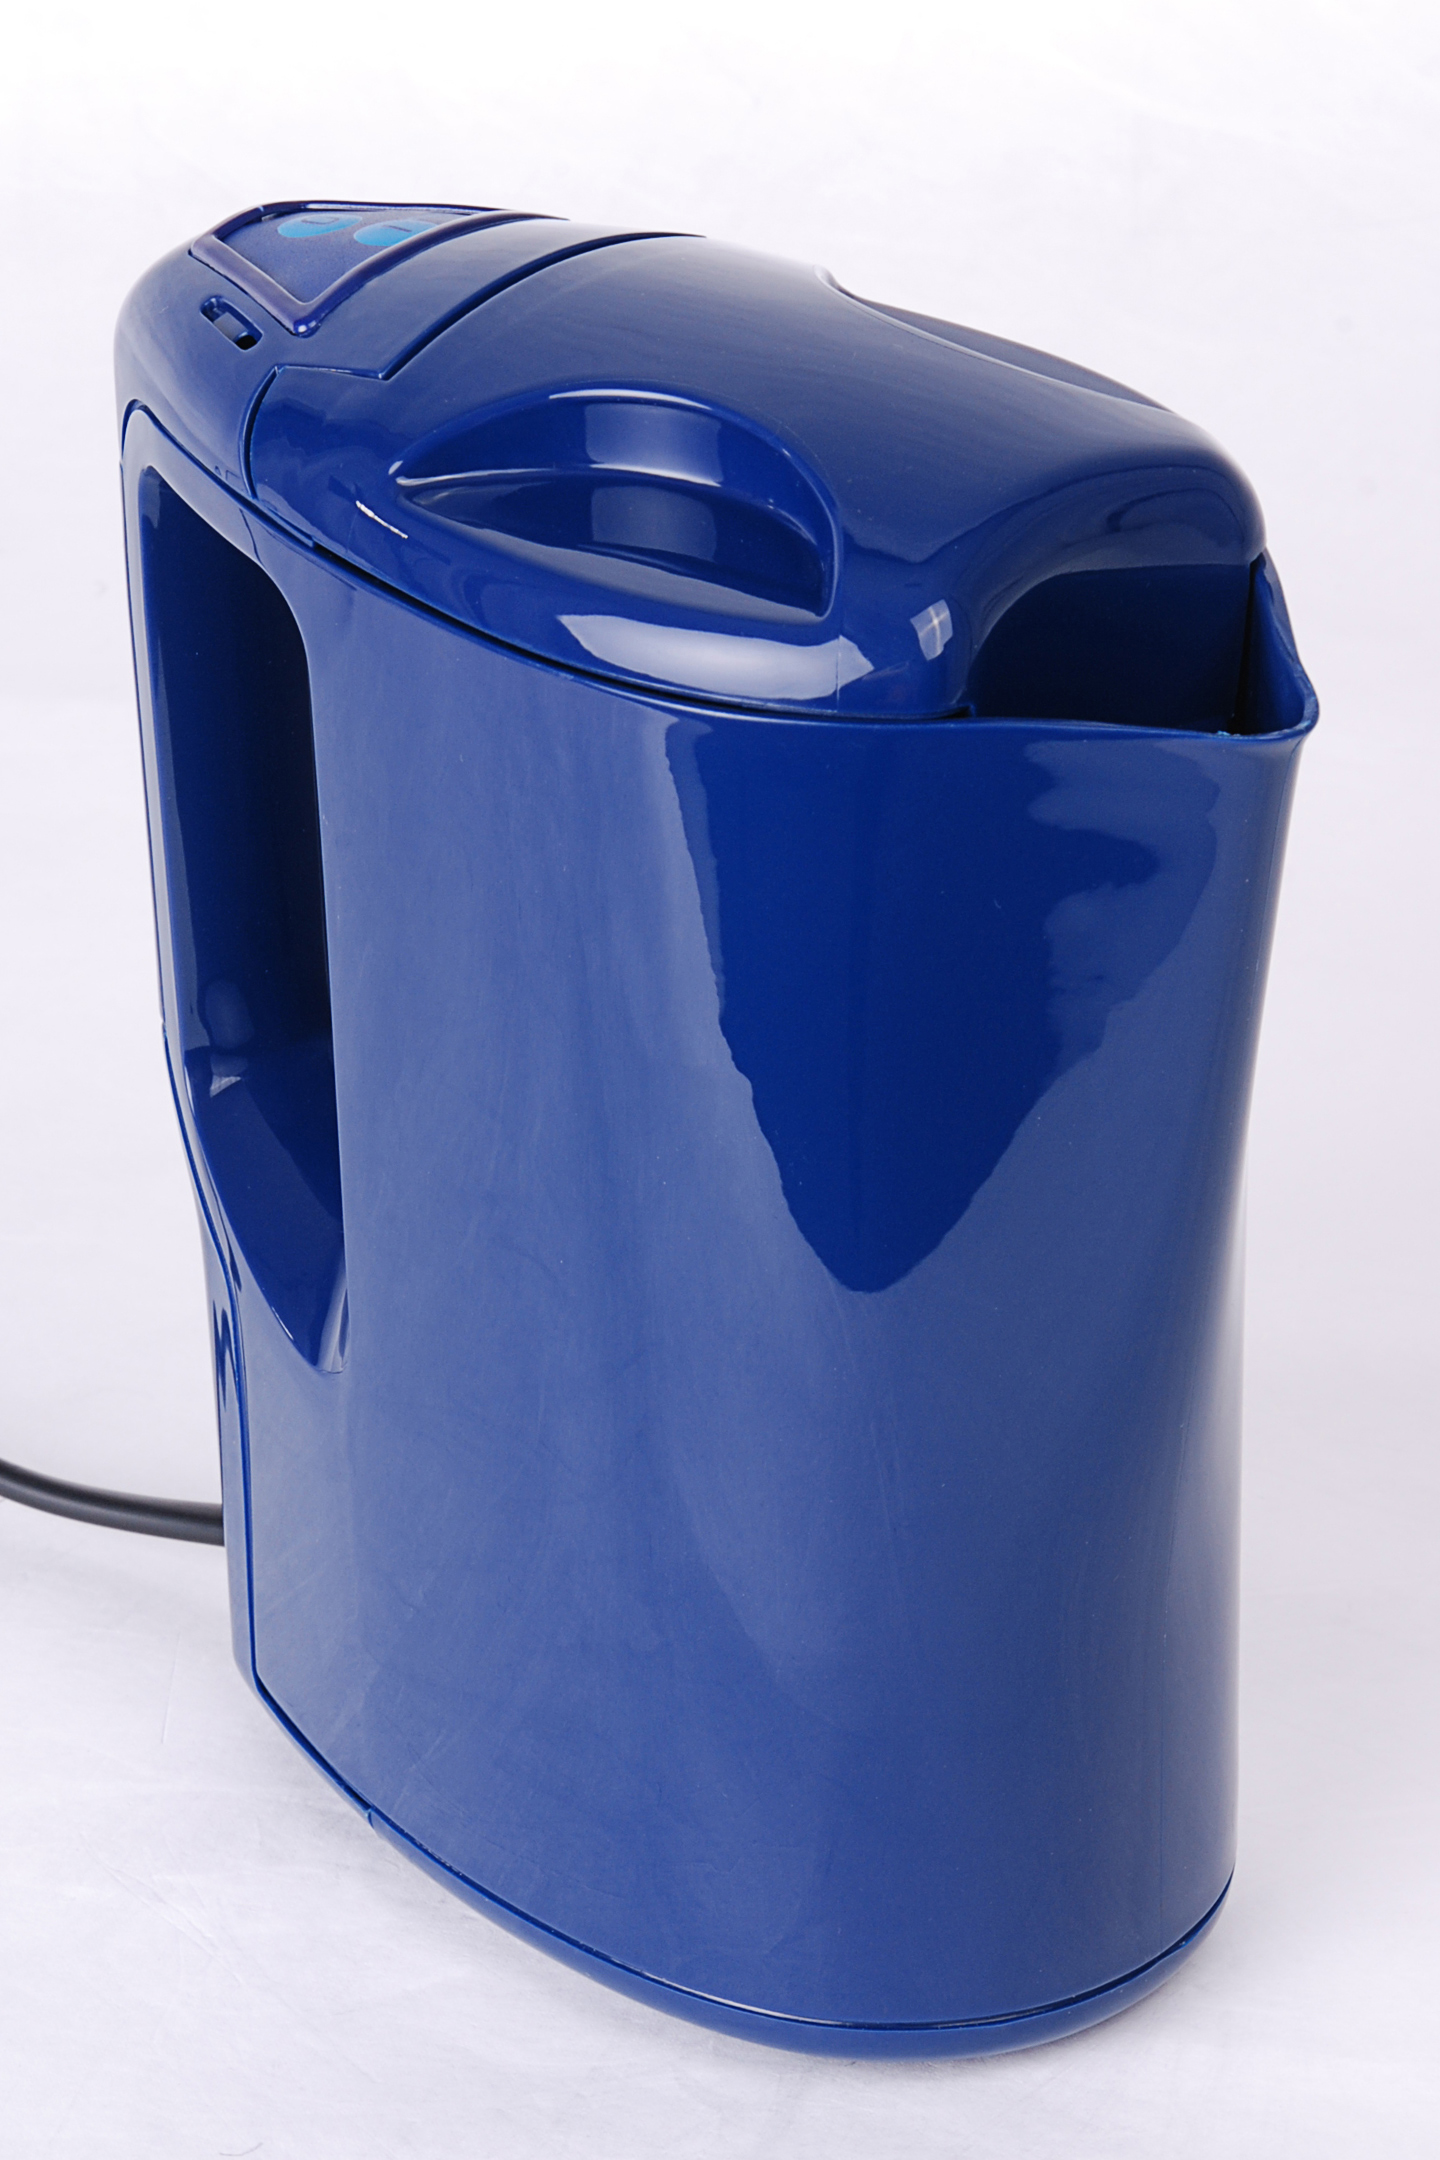 wasserkocher 24 v f r lkw auto camping 24v 1l blau ebay. Black Bedroom Furniture Sets. Home Design Ideas